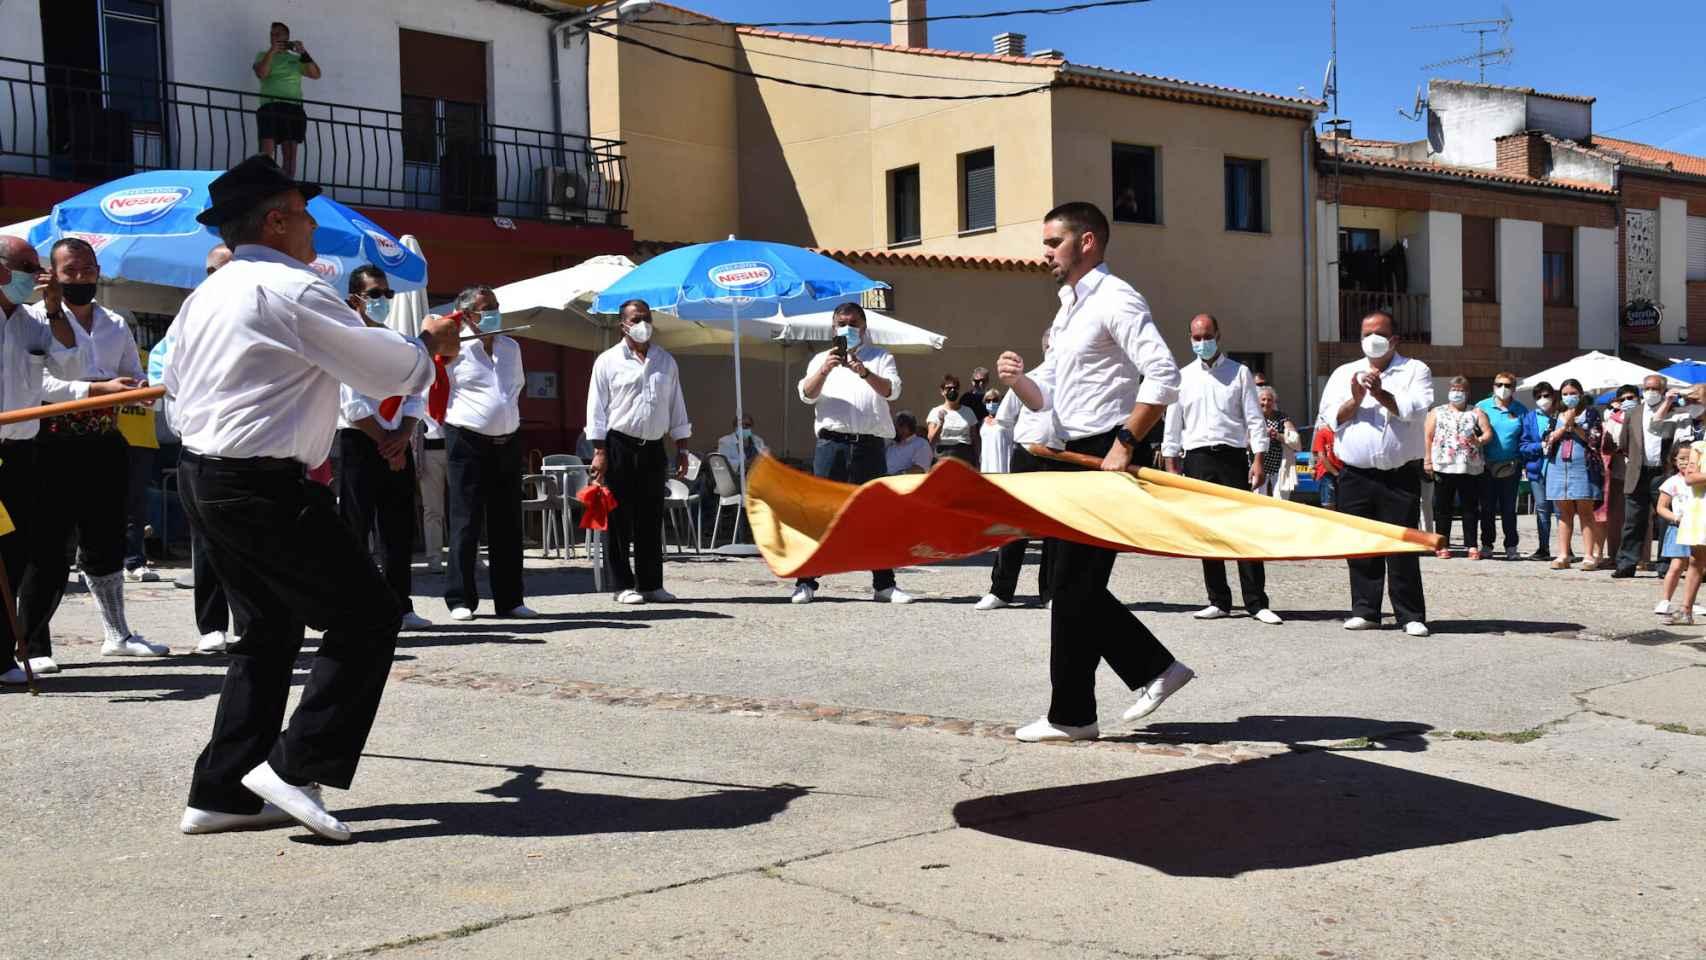 Baile de la Bandera - San Juan 2021 - Hinojosa de Duero (Salamanca) 1